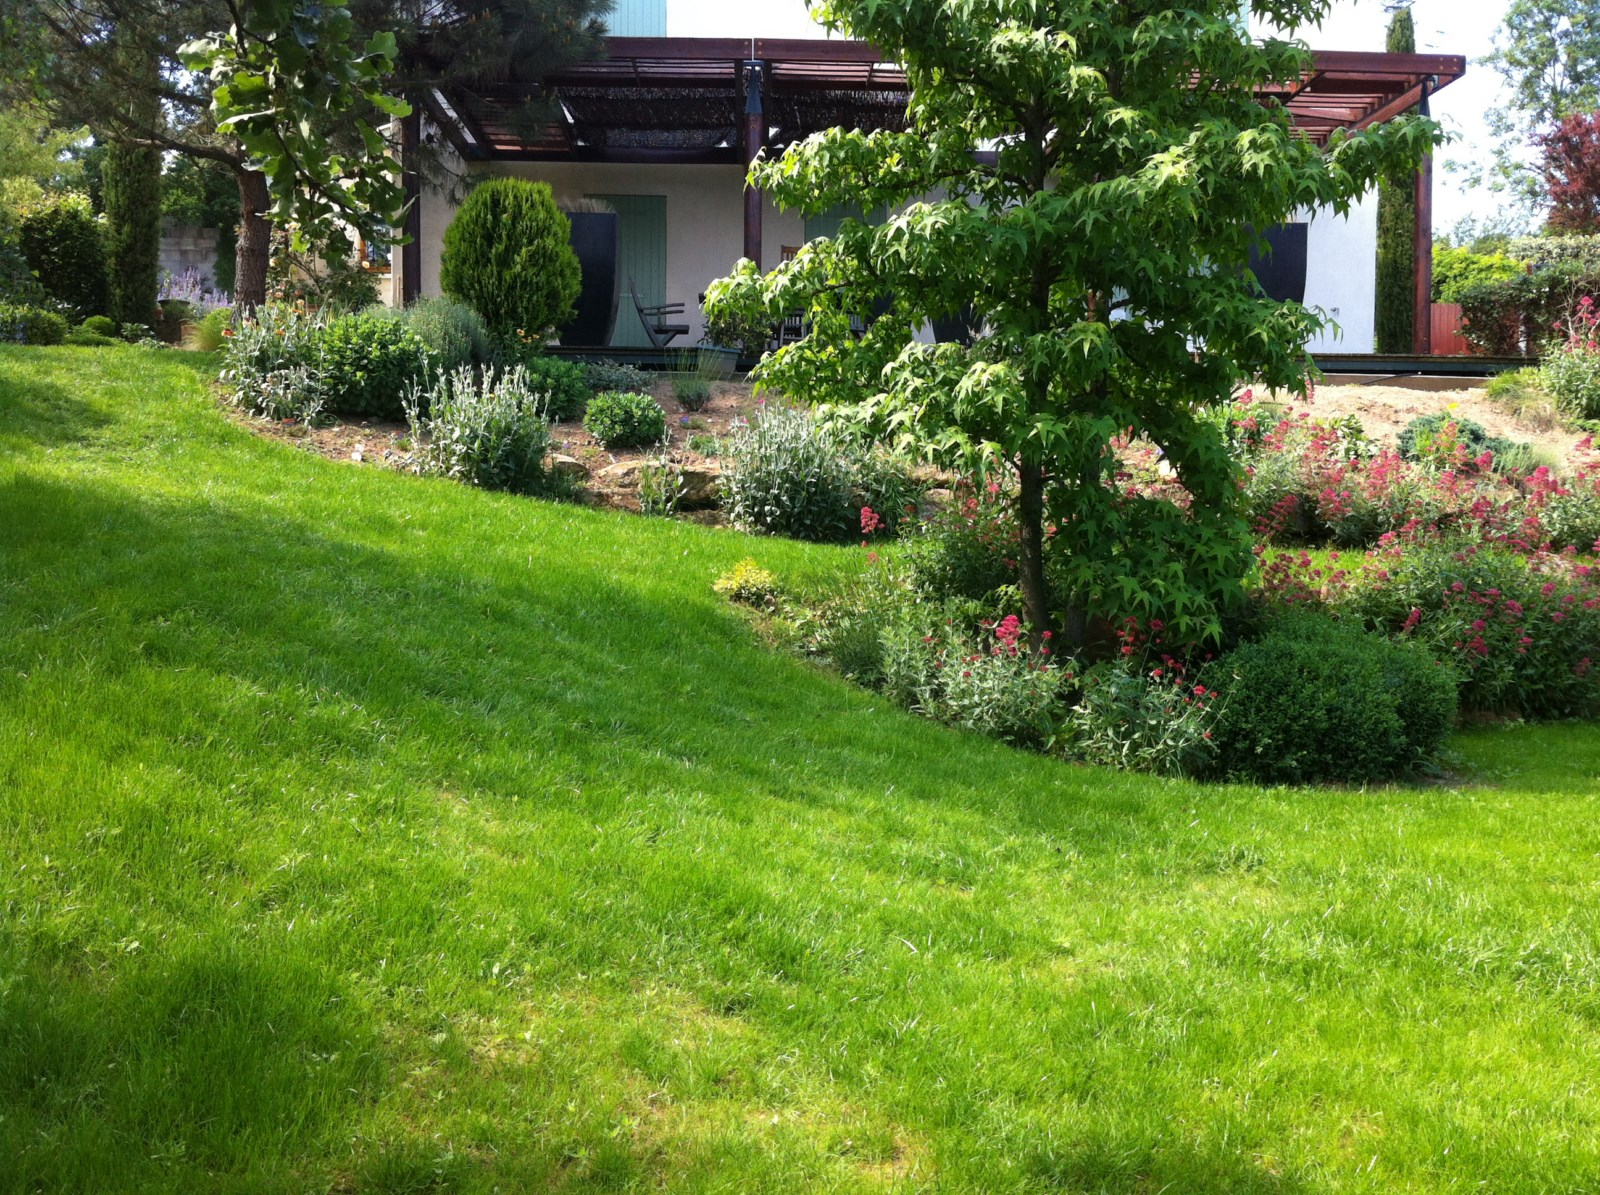 Entretien jardin automne en automne pr voyez vos travaux for Entretien jardin